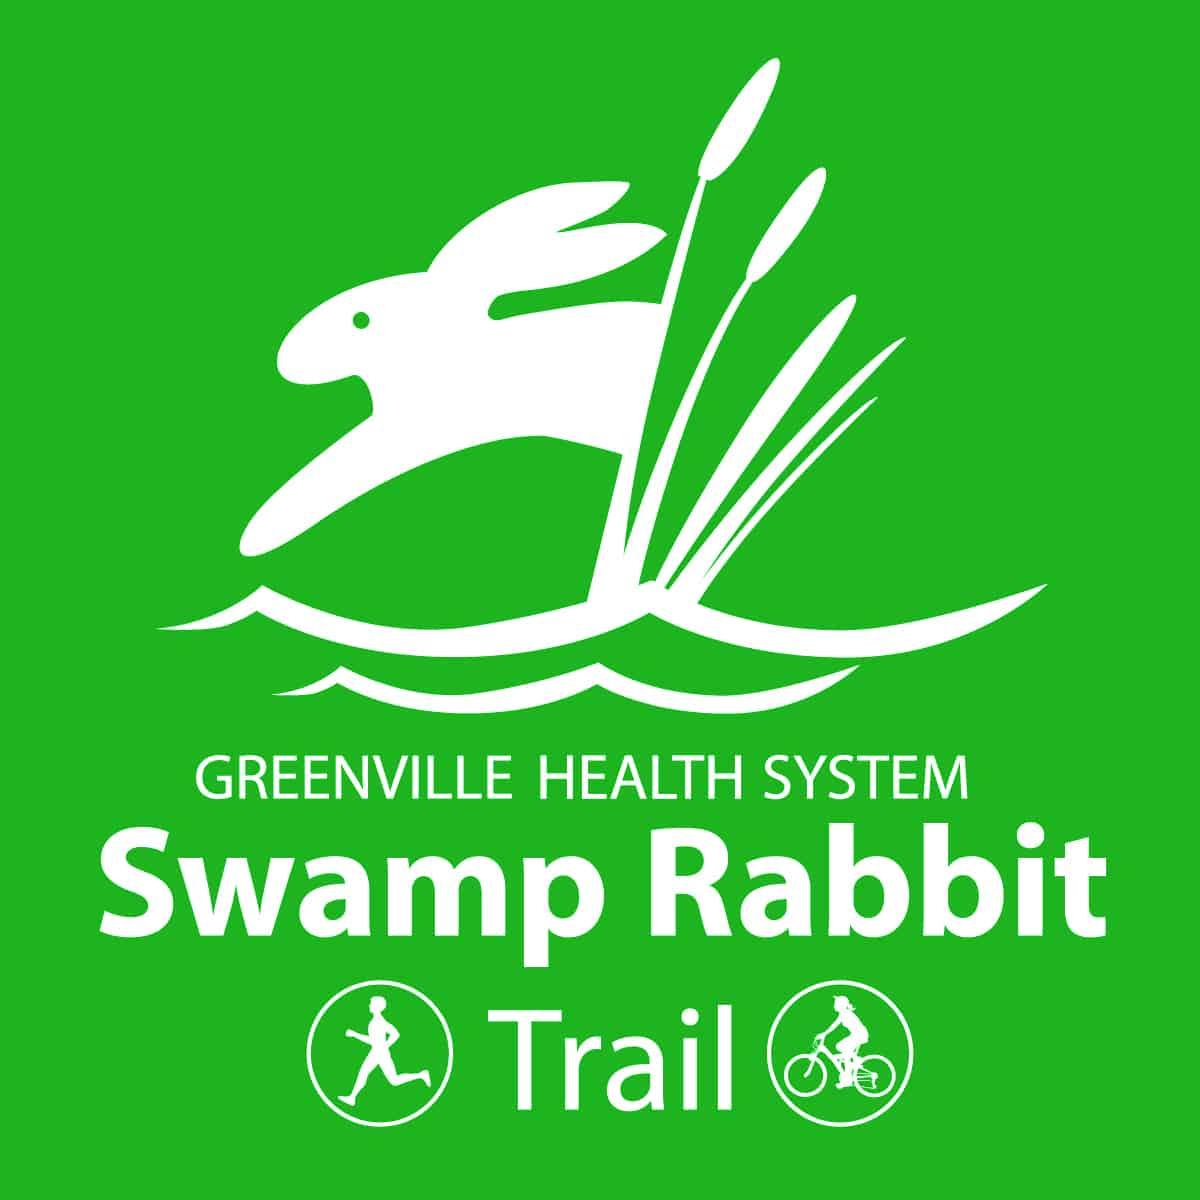 Swamp-Rabbit-Trail-Logo-Green-no-hex-01